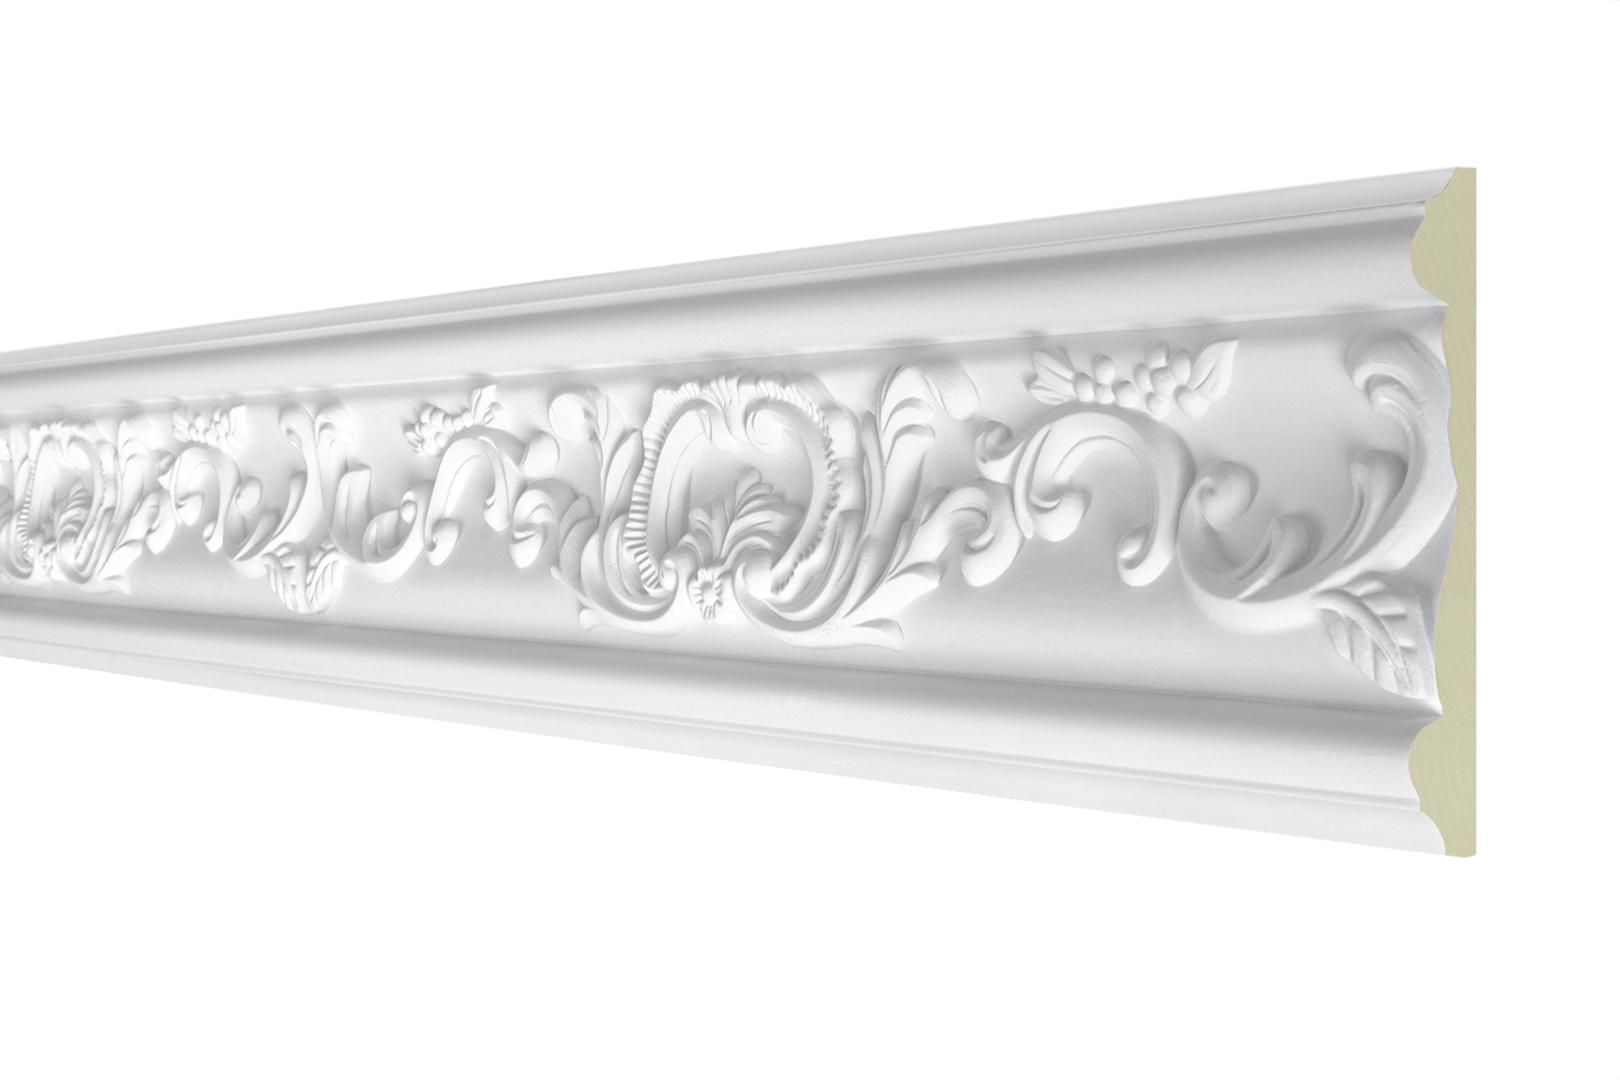 2 Meter Flachprofil - Stuckleiste aus PU gemustert, stoßfest - Perfect AC Serie 1